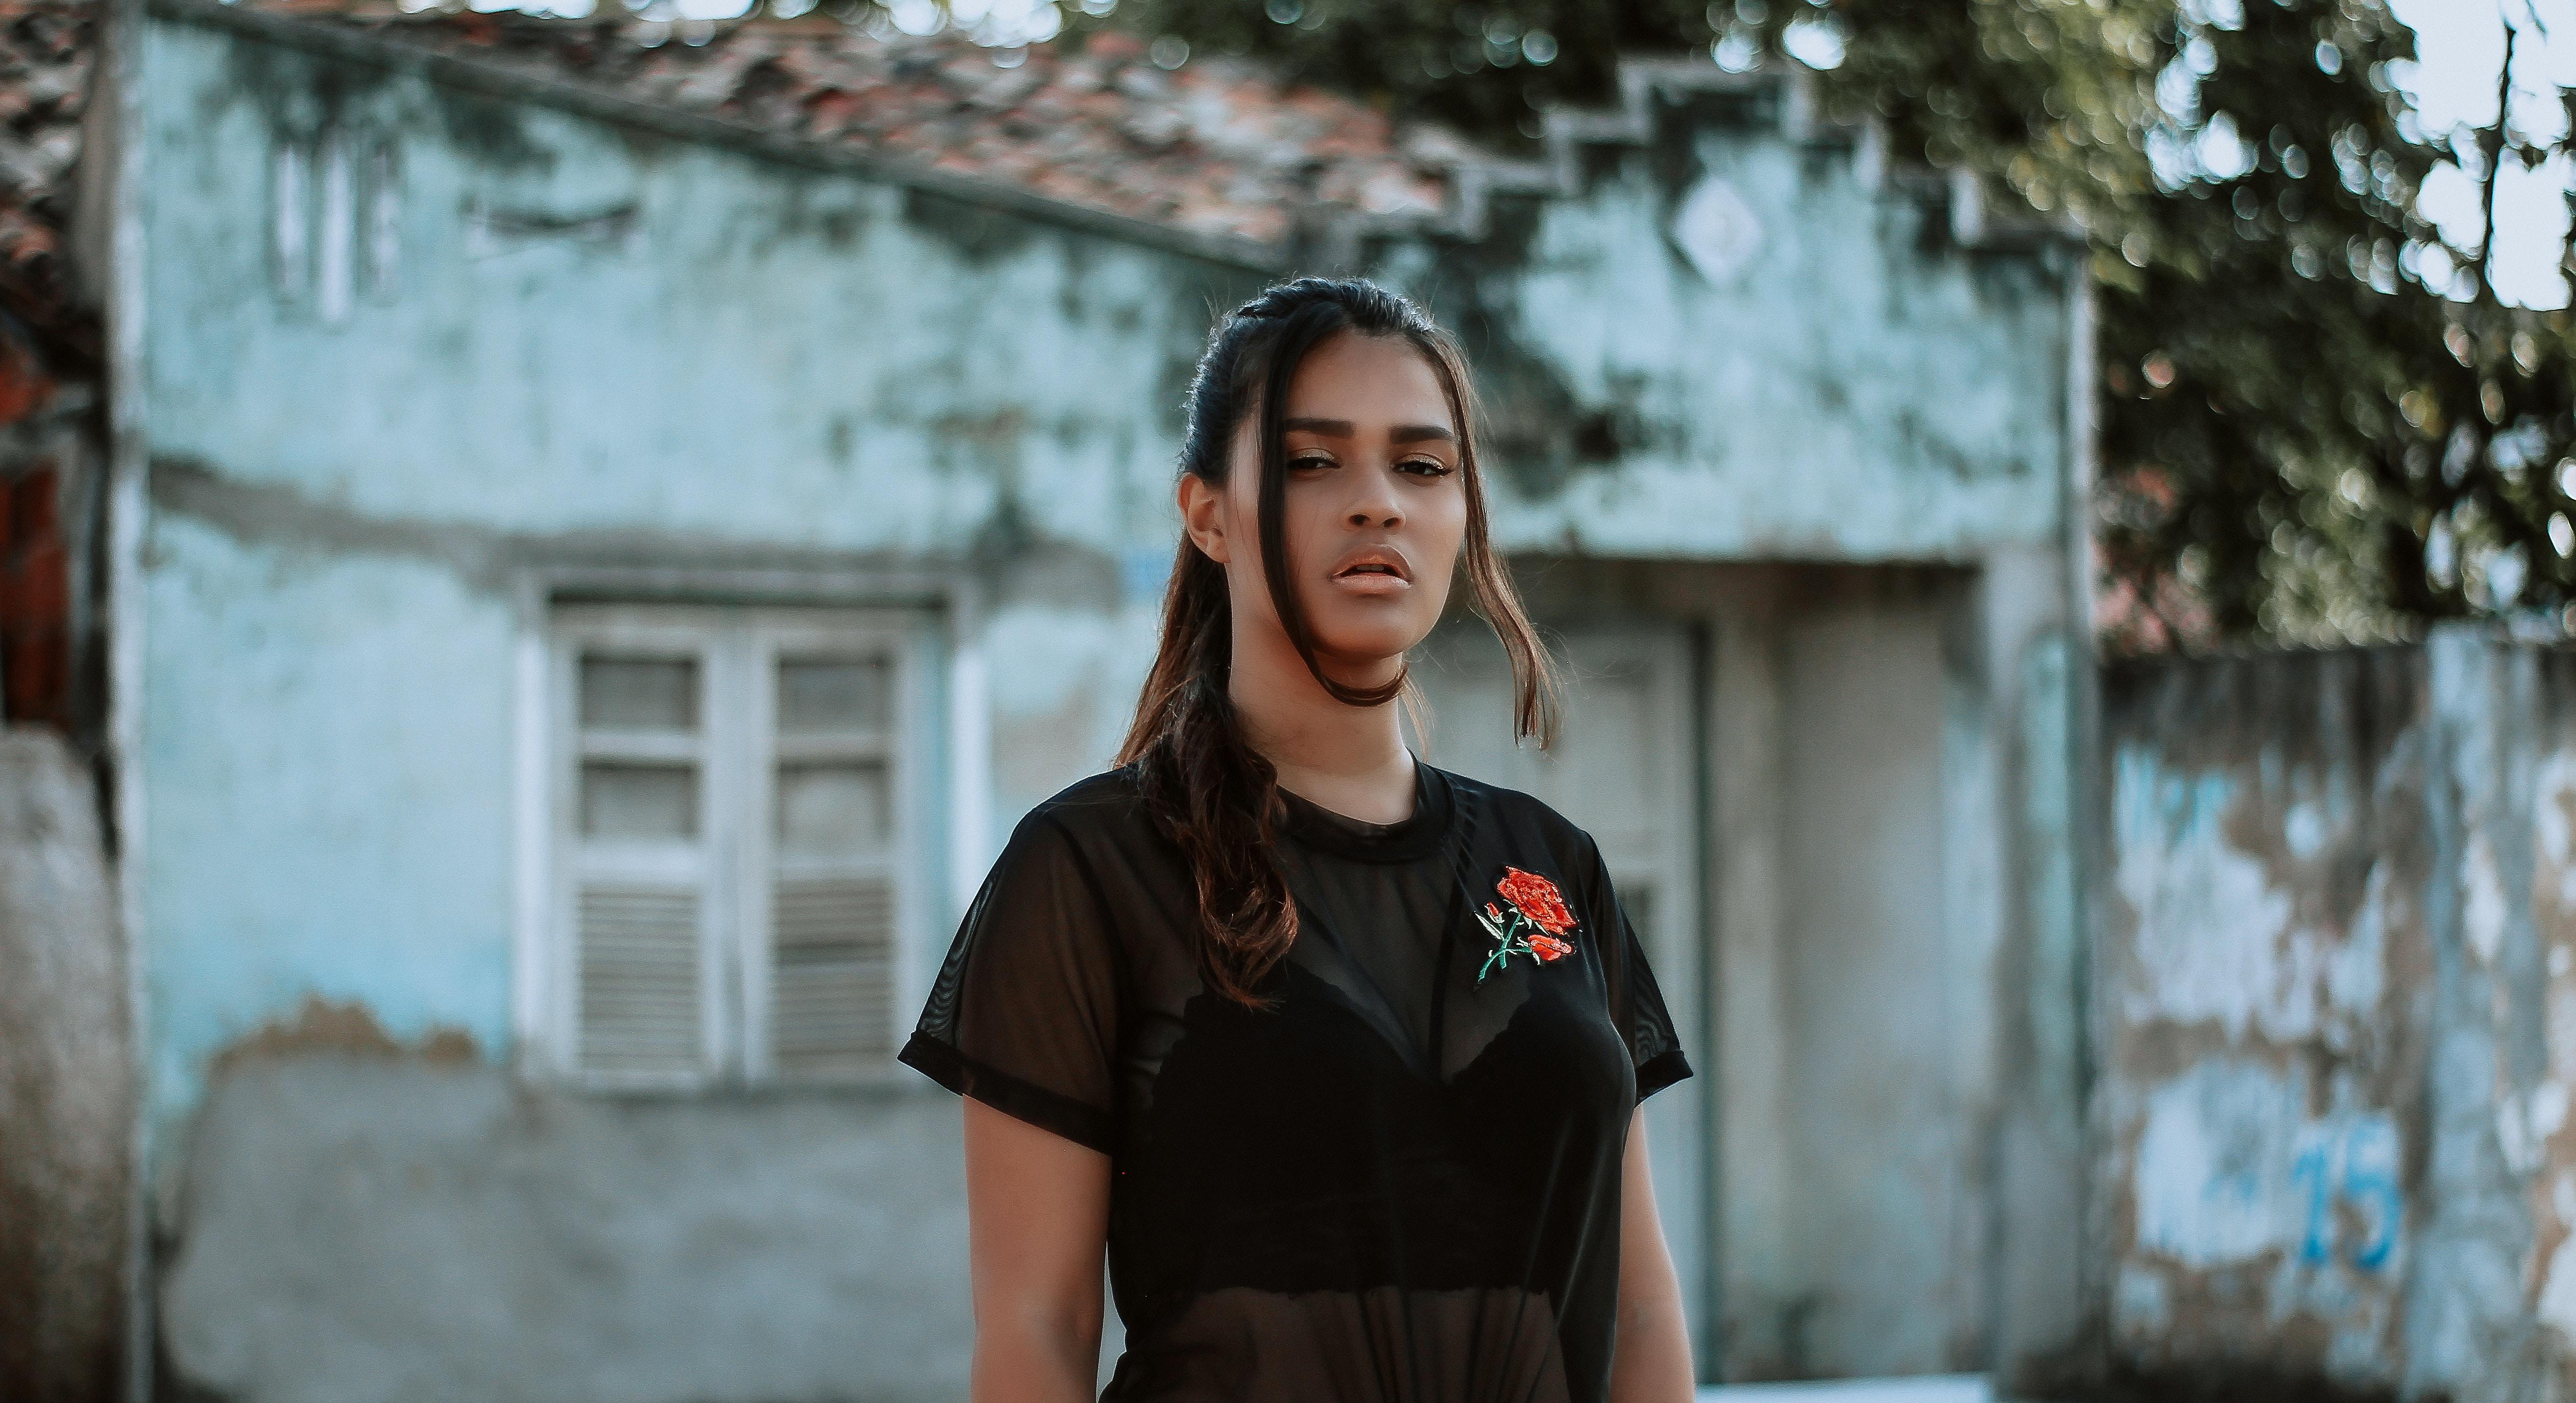 woman wearing black short-sleeved dress near house